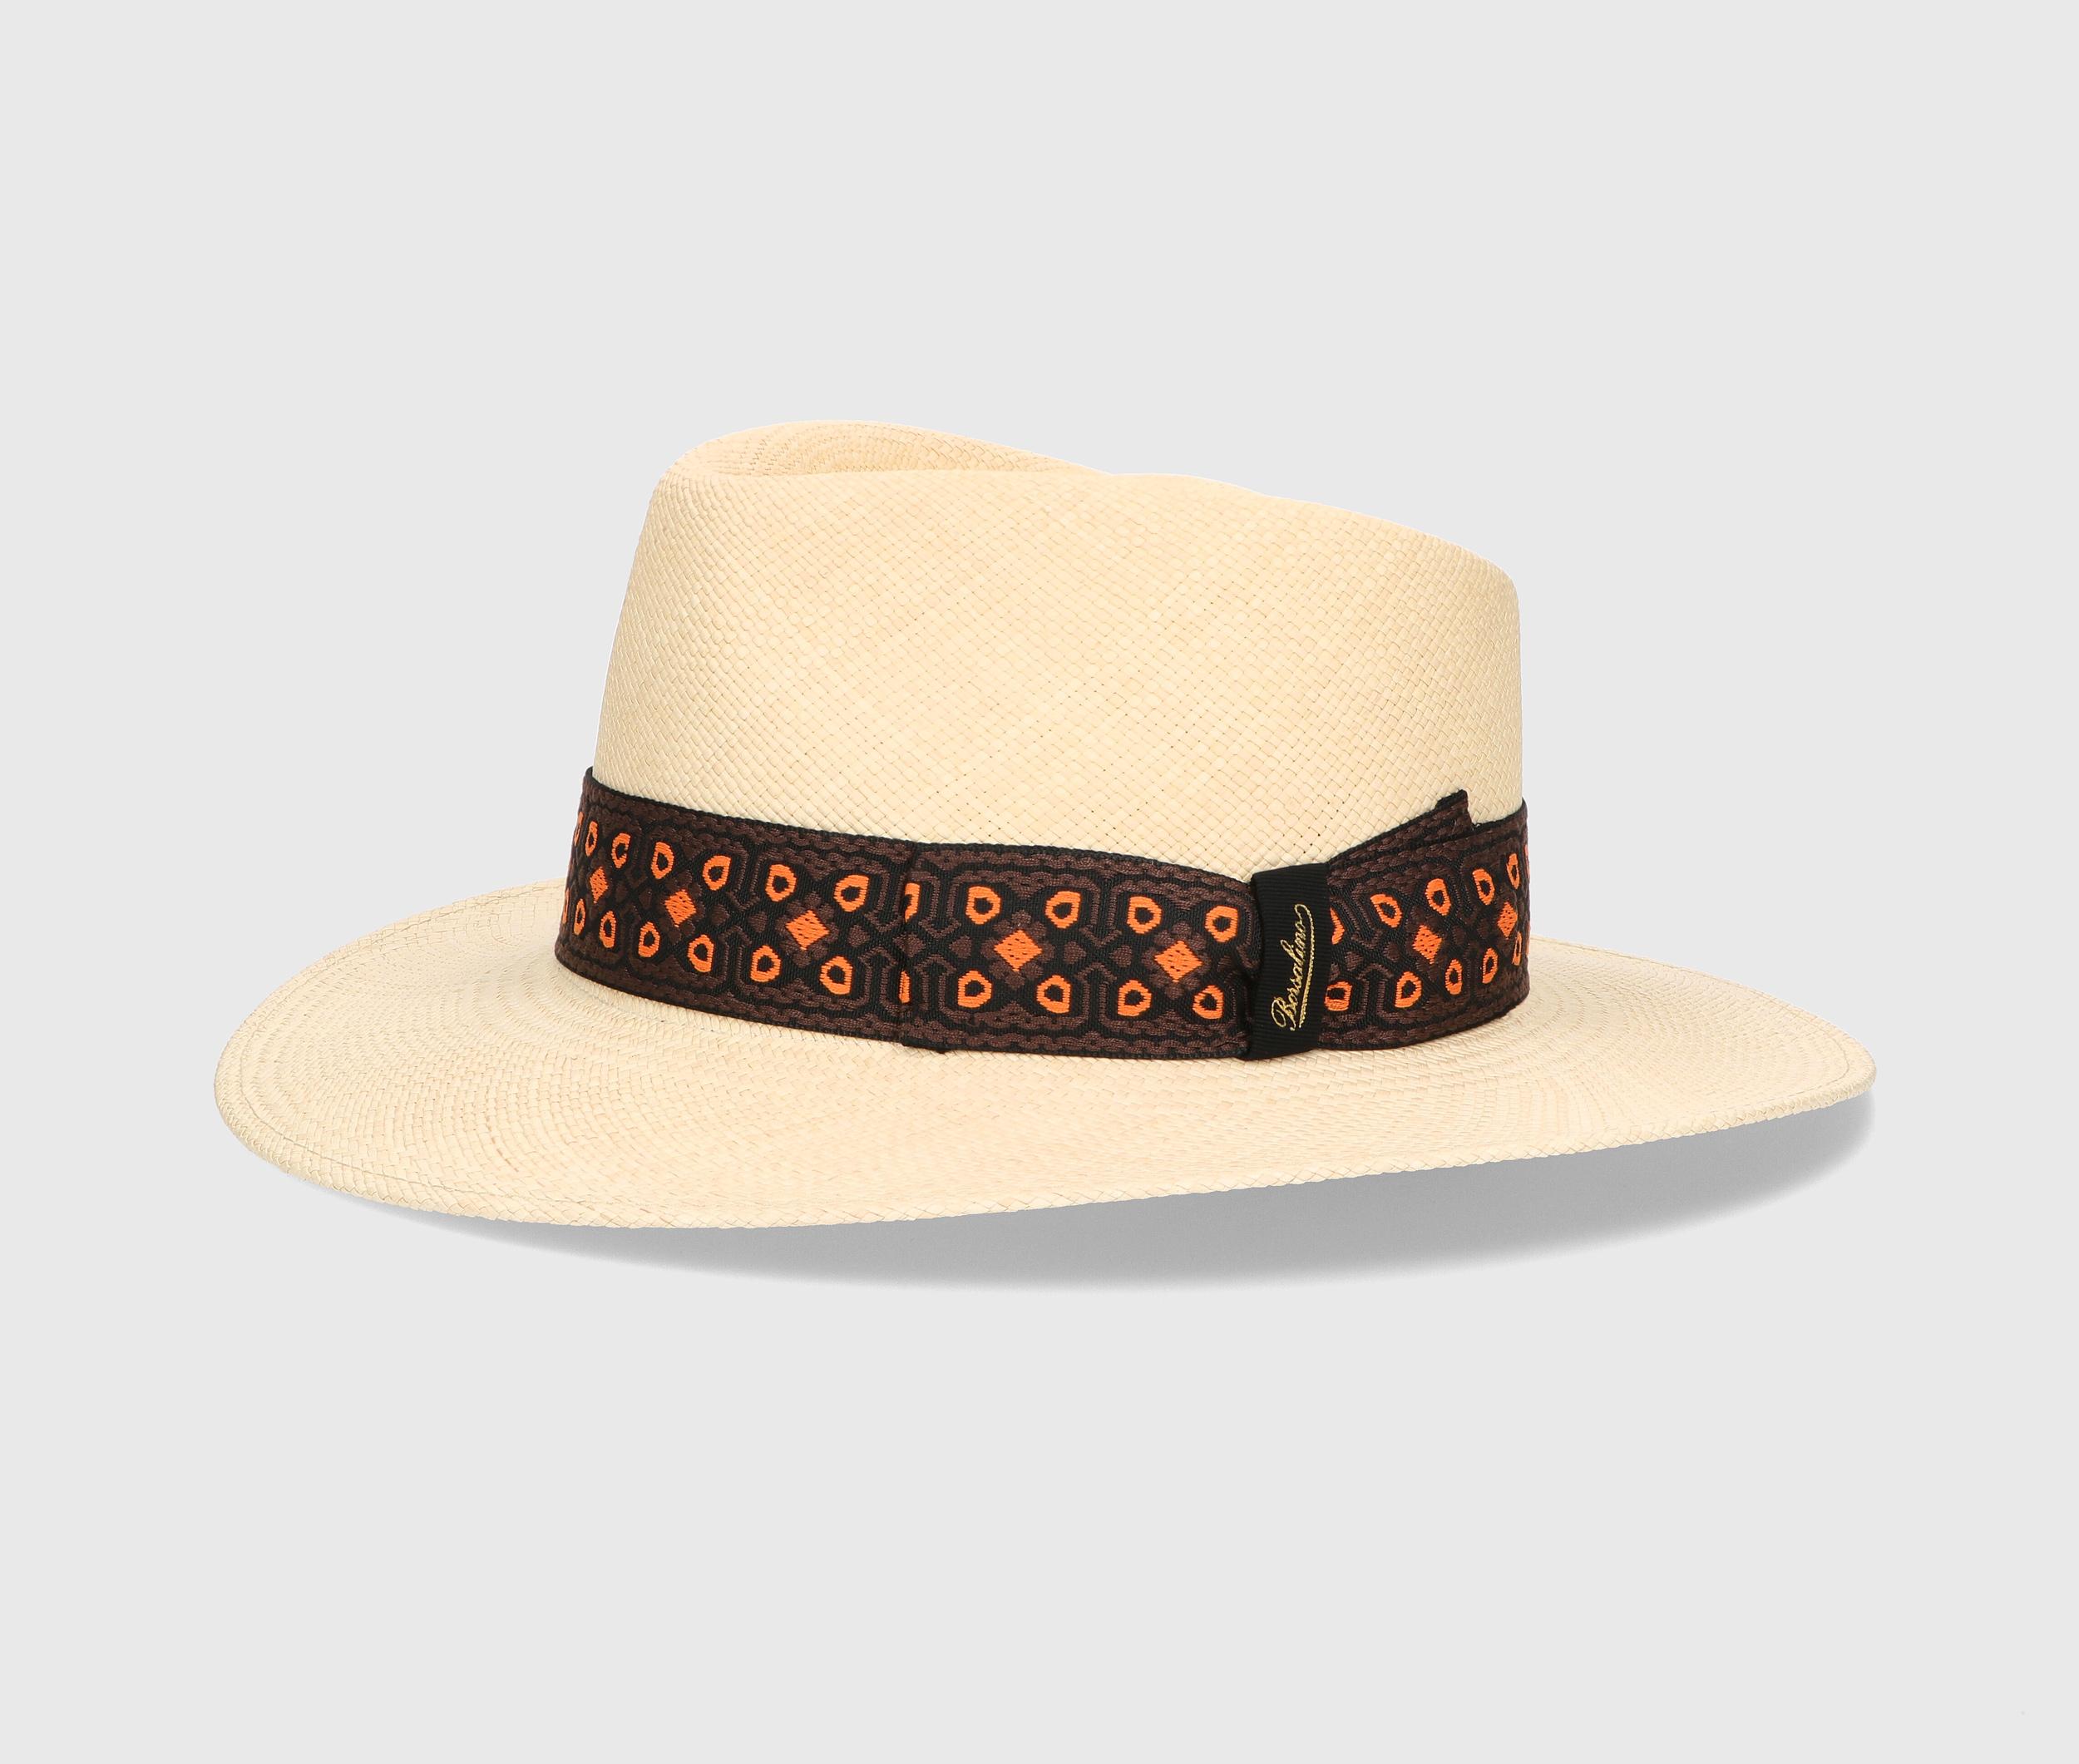 A Borsalino hat for spring 2022.